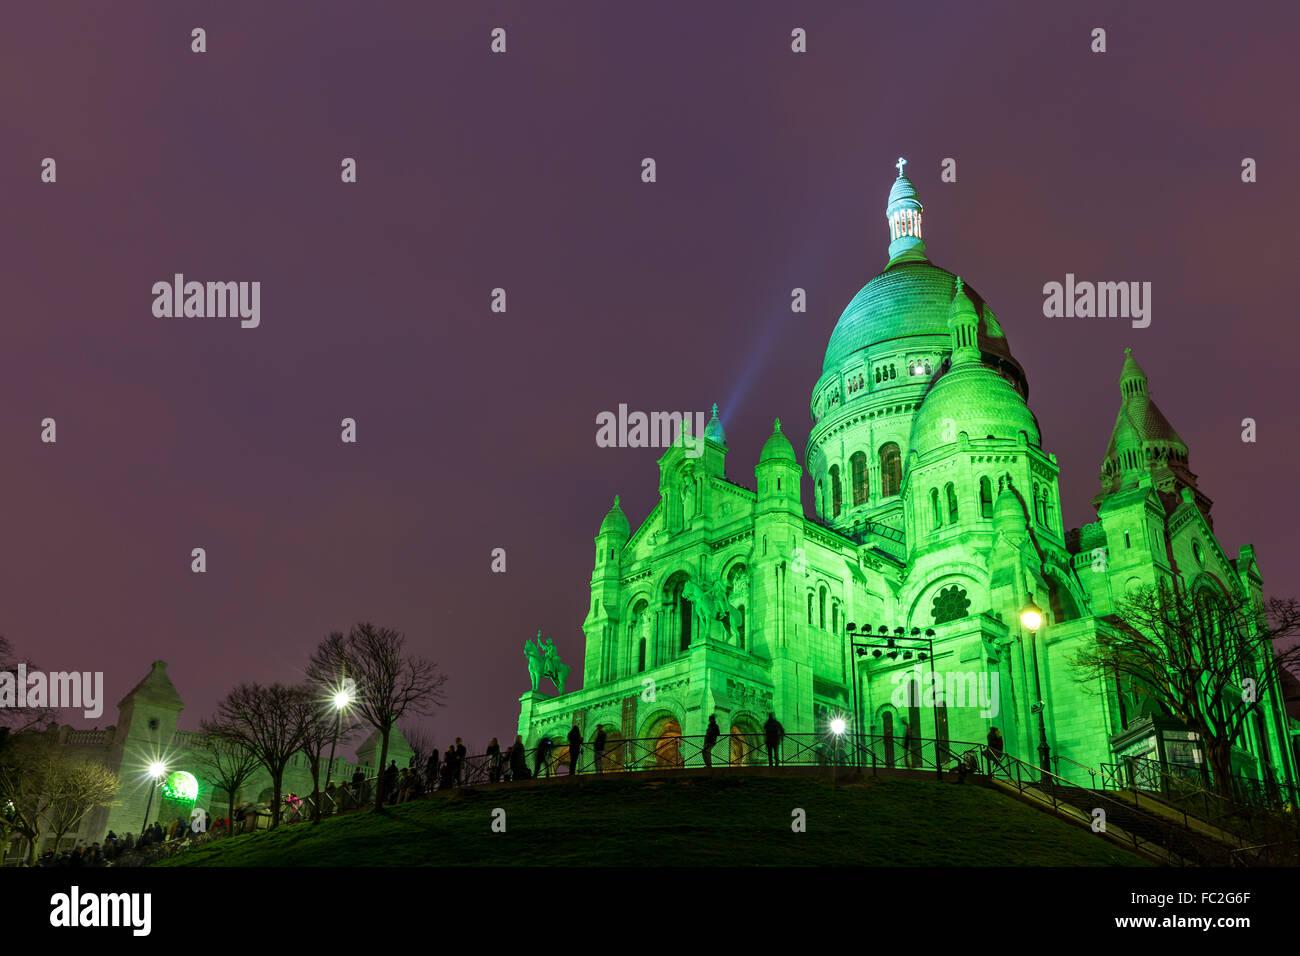 Sacre Coeur in Montmartre, Paris at night - Stock Image